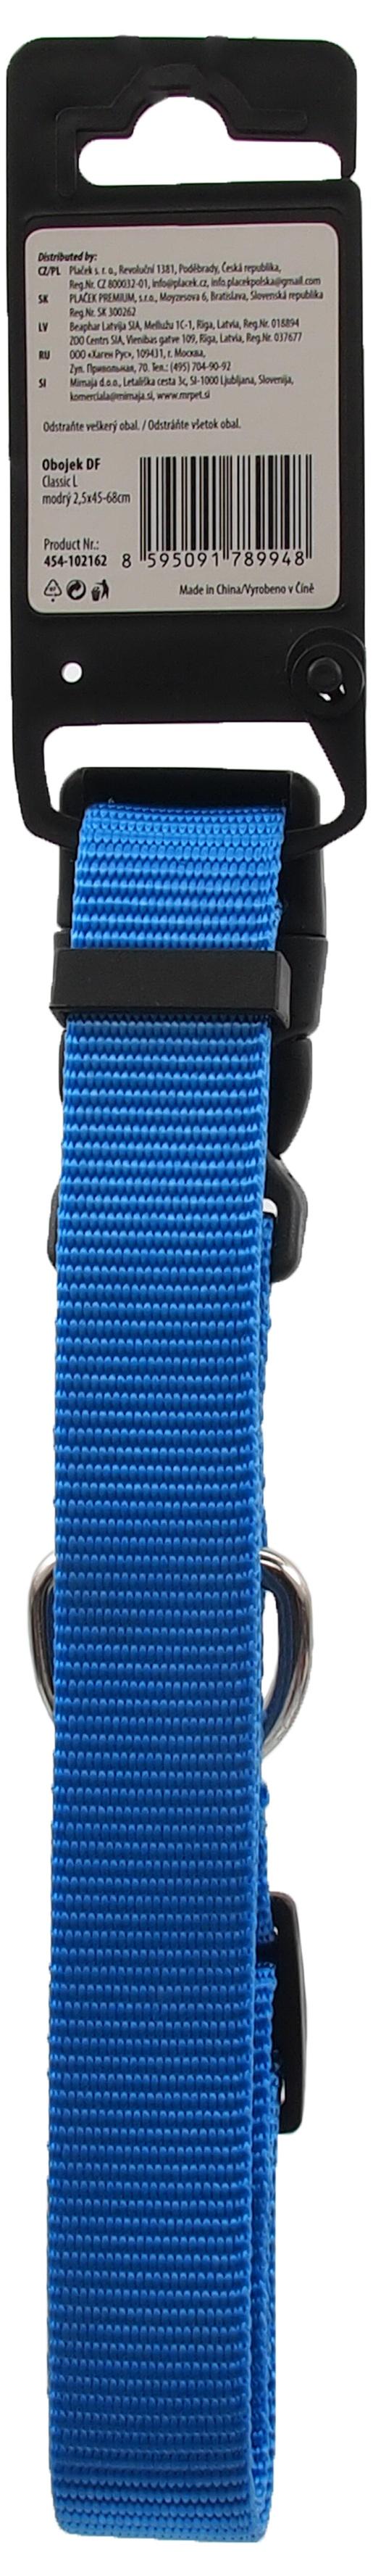 Ошейник - Dog Fantasy Classic Неилон L, 2.5cm, 45-68cm, цвет - синий